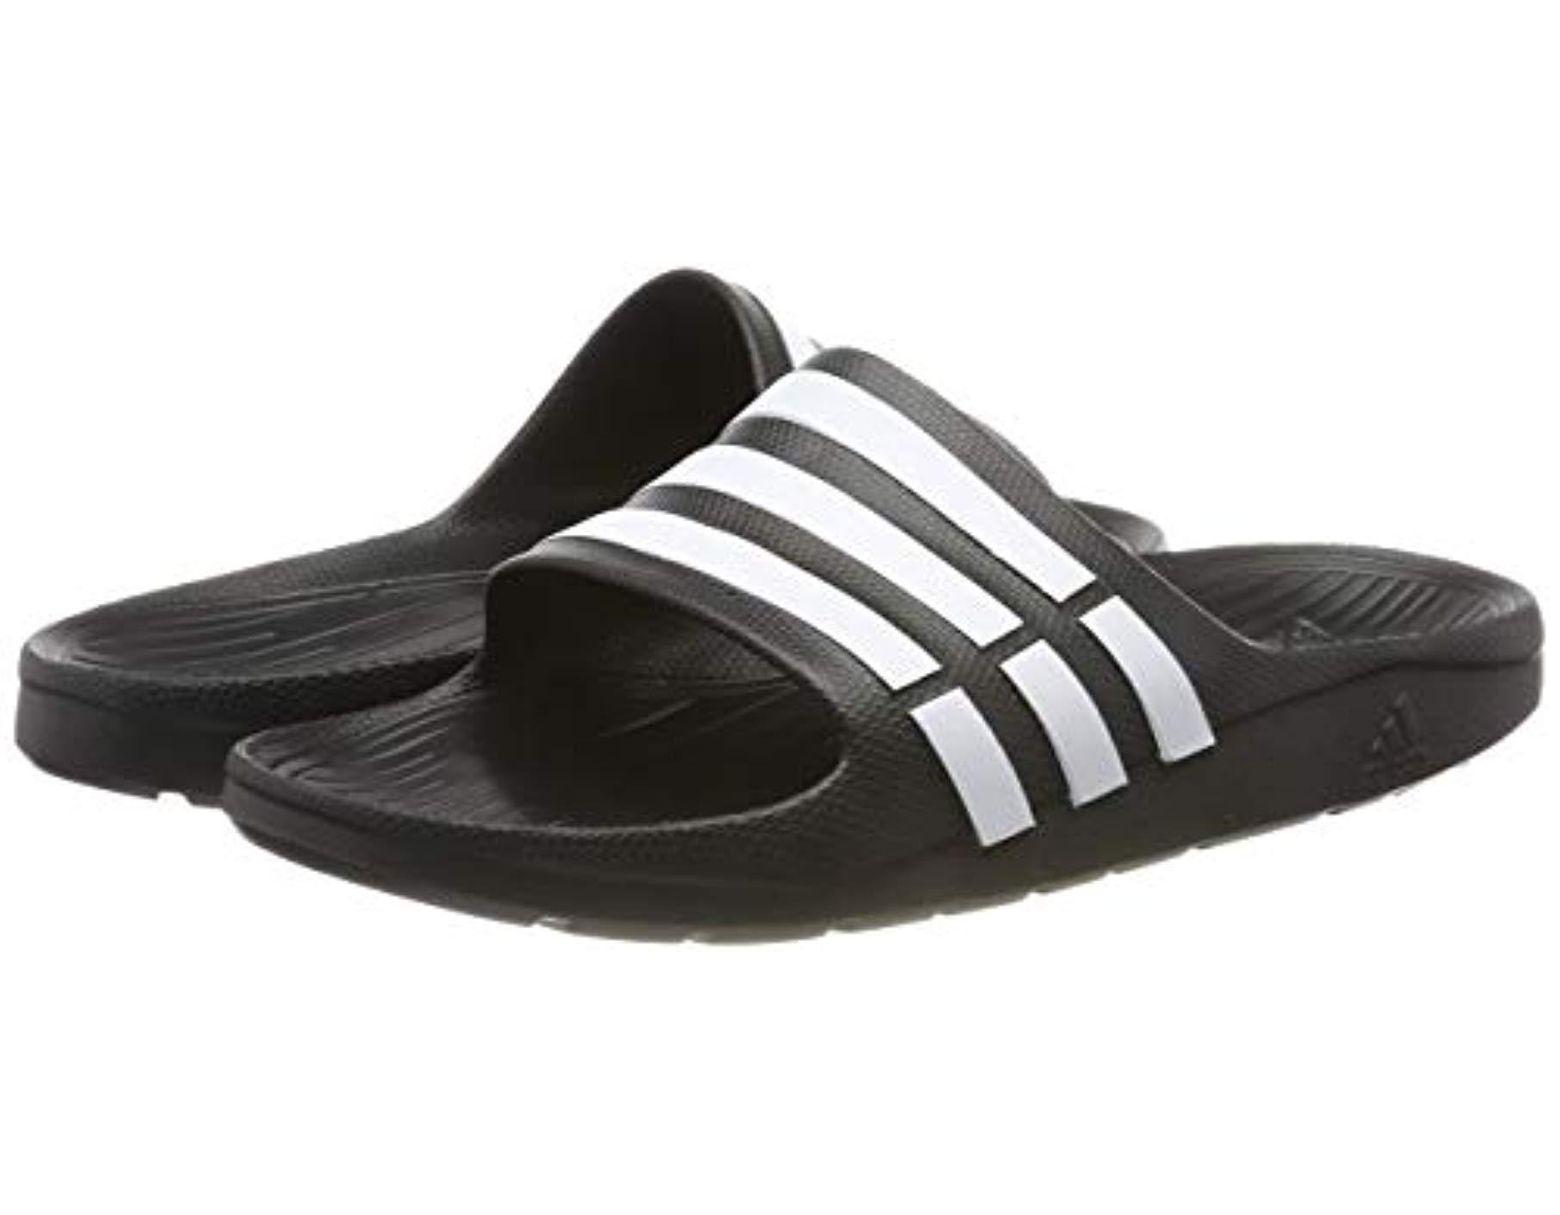 chaussures de plage et piscine adidas